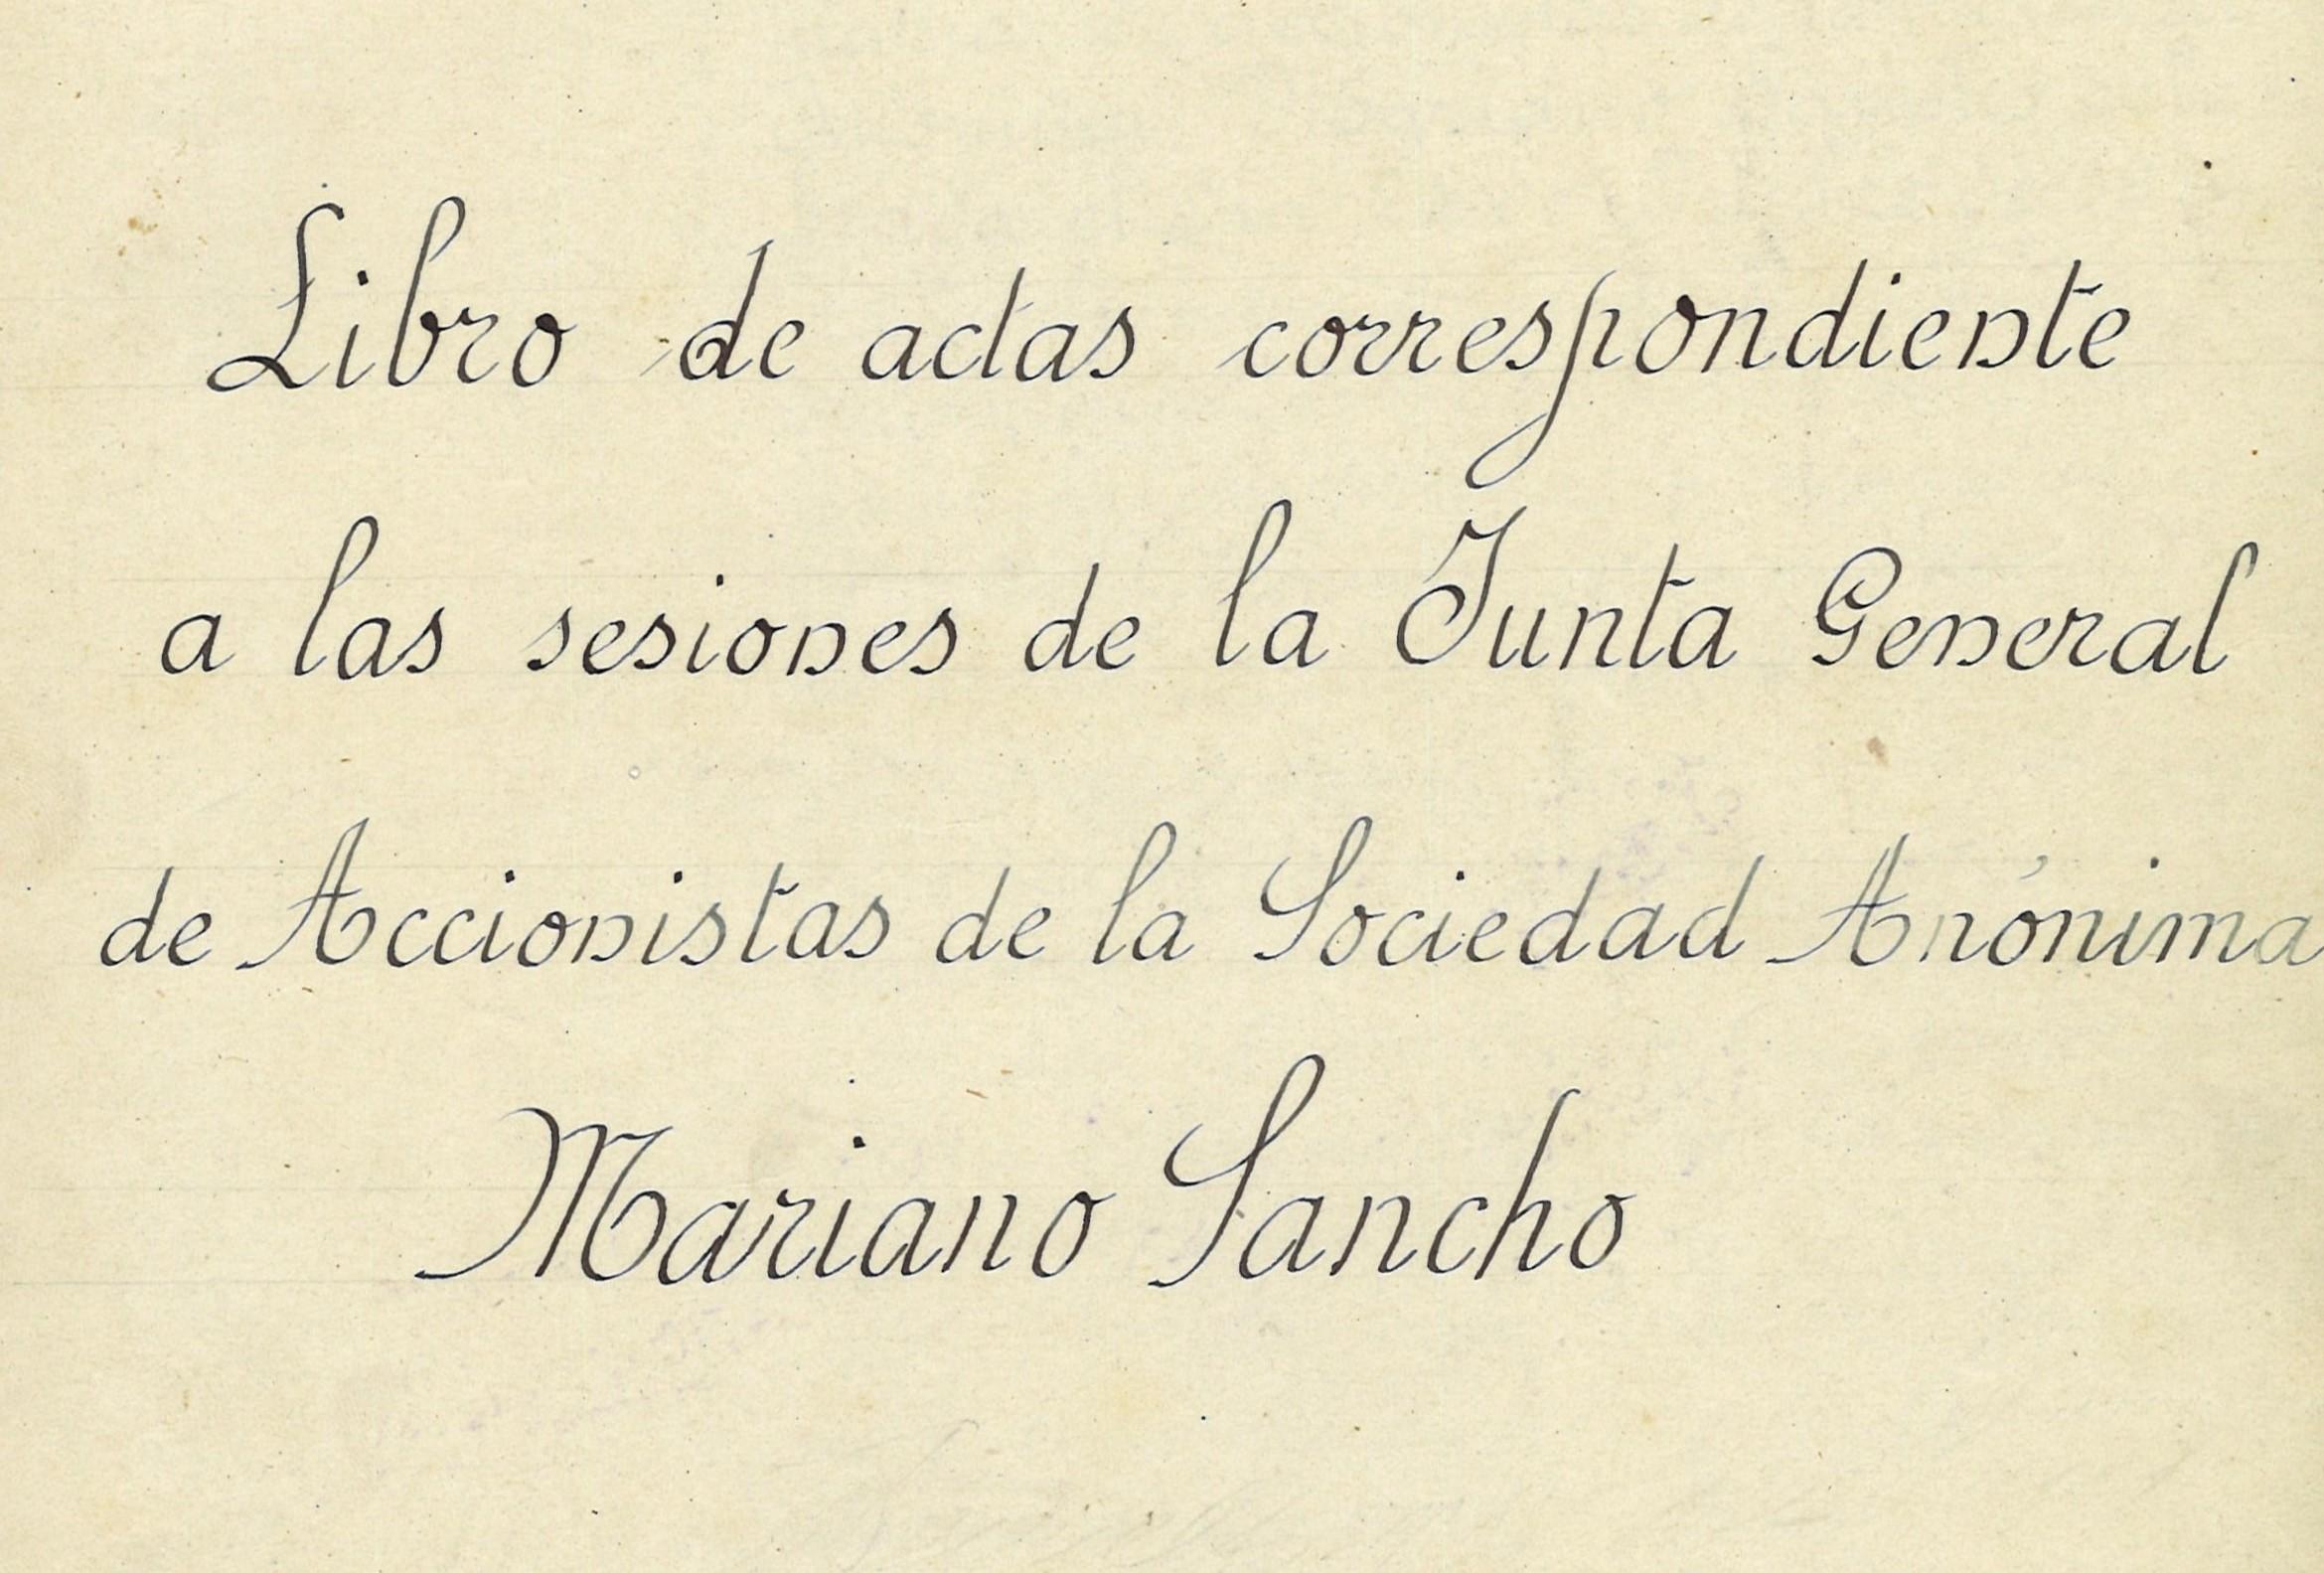 Mariano Sancho, S.A.